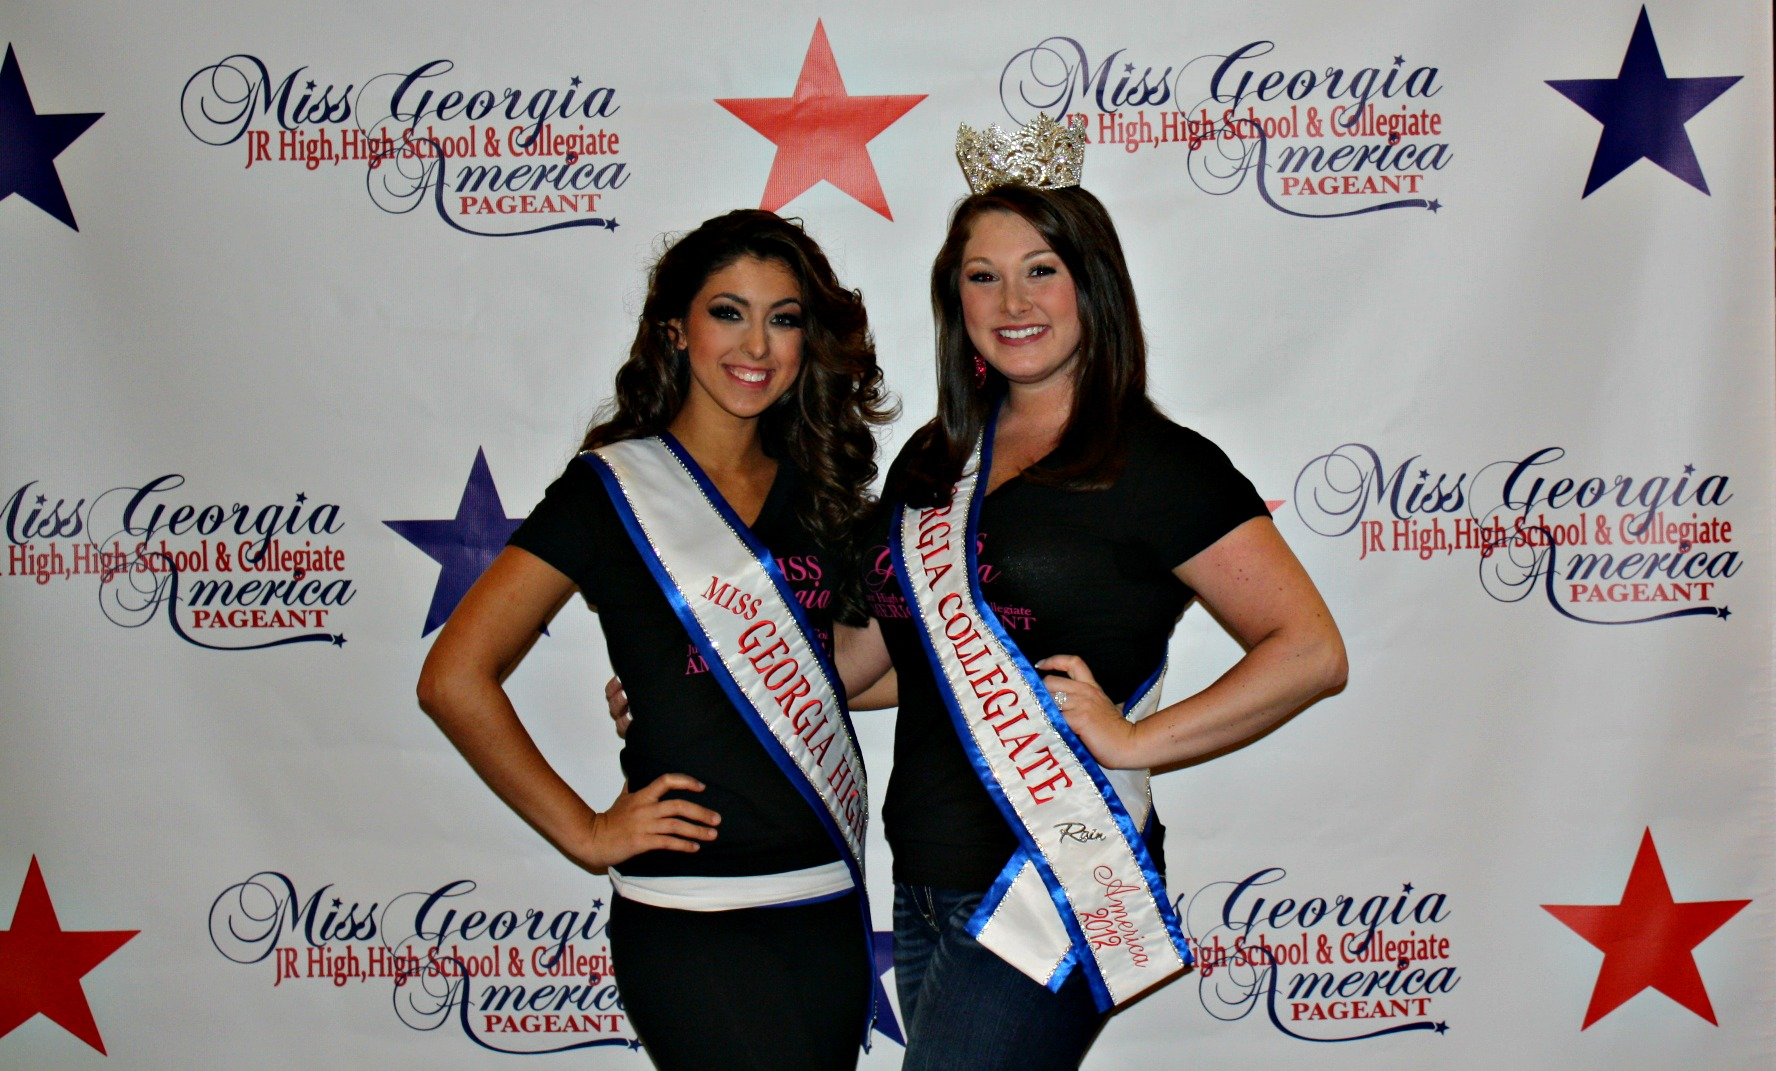 Miss Georgia Junior High, High School & Collegiate